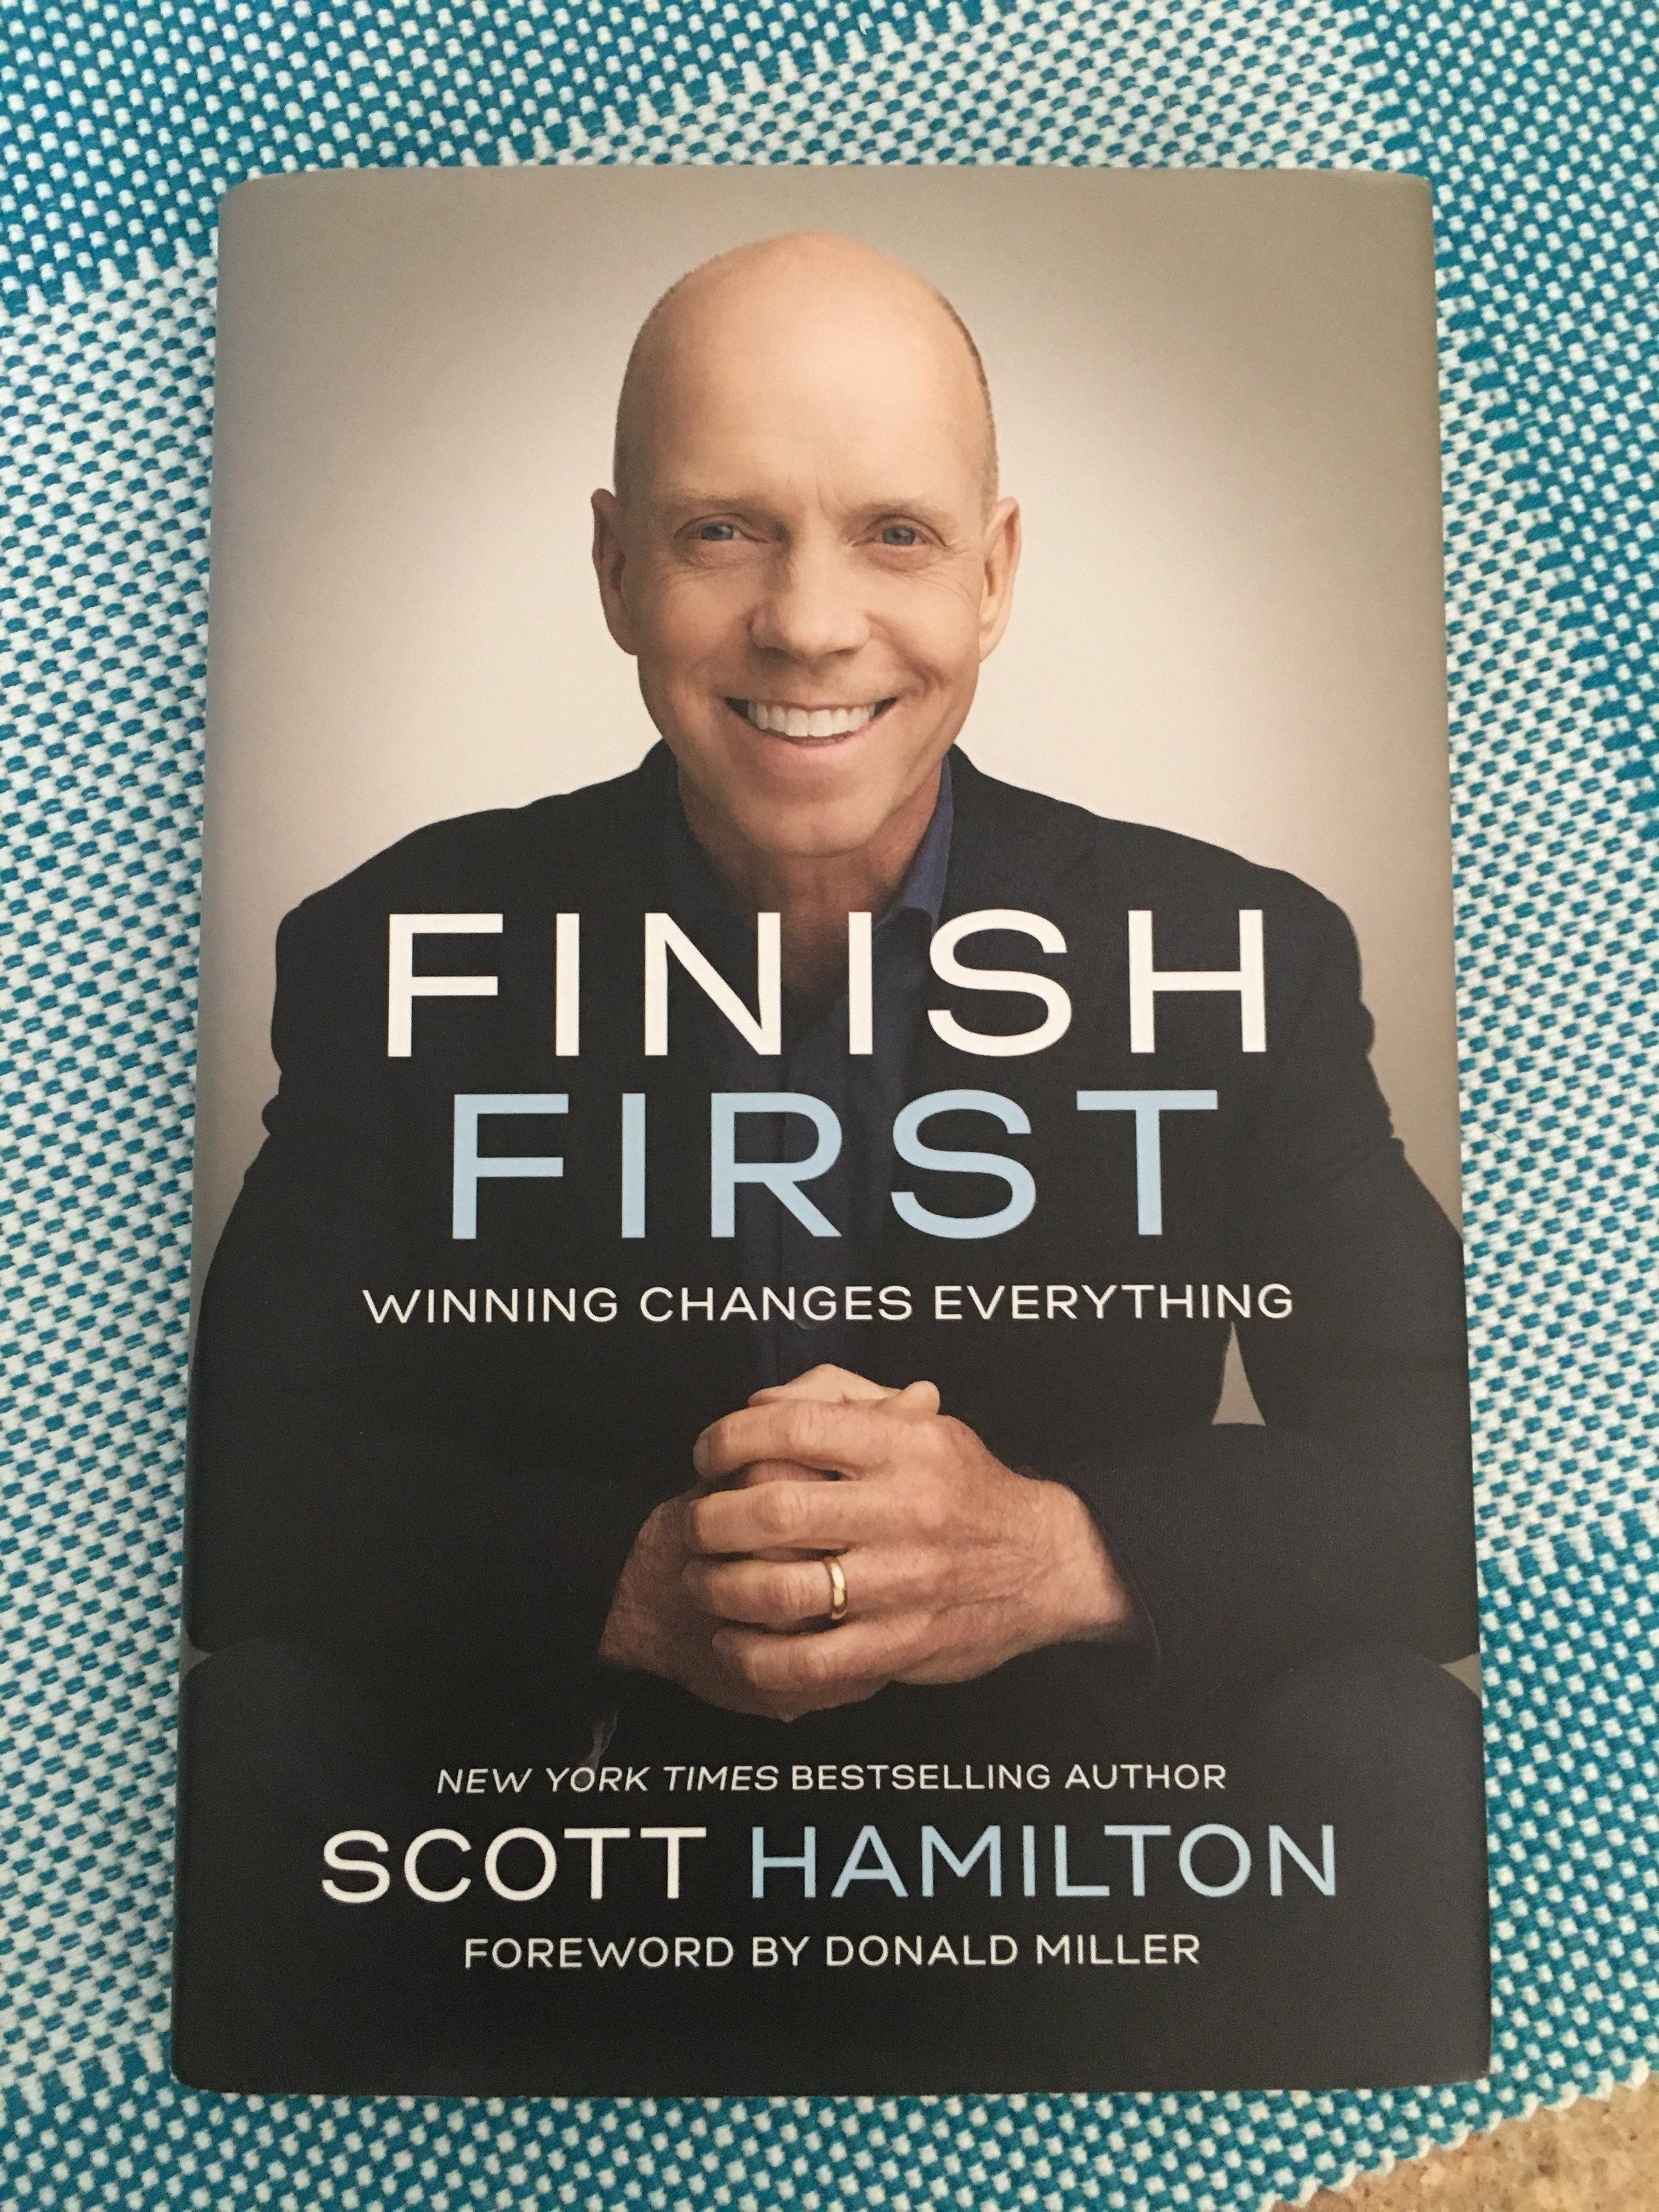 Scott Hamilton FINISH FIRST.JPG